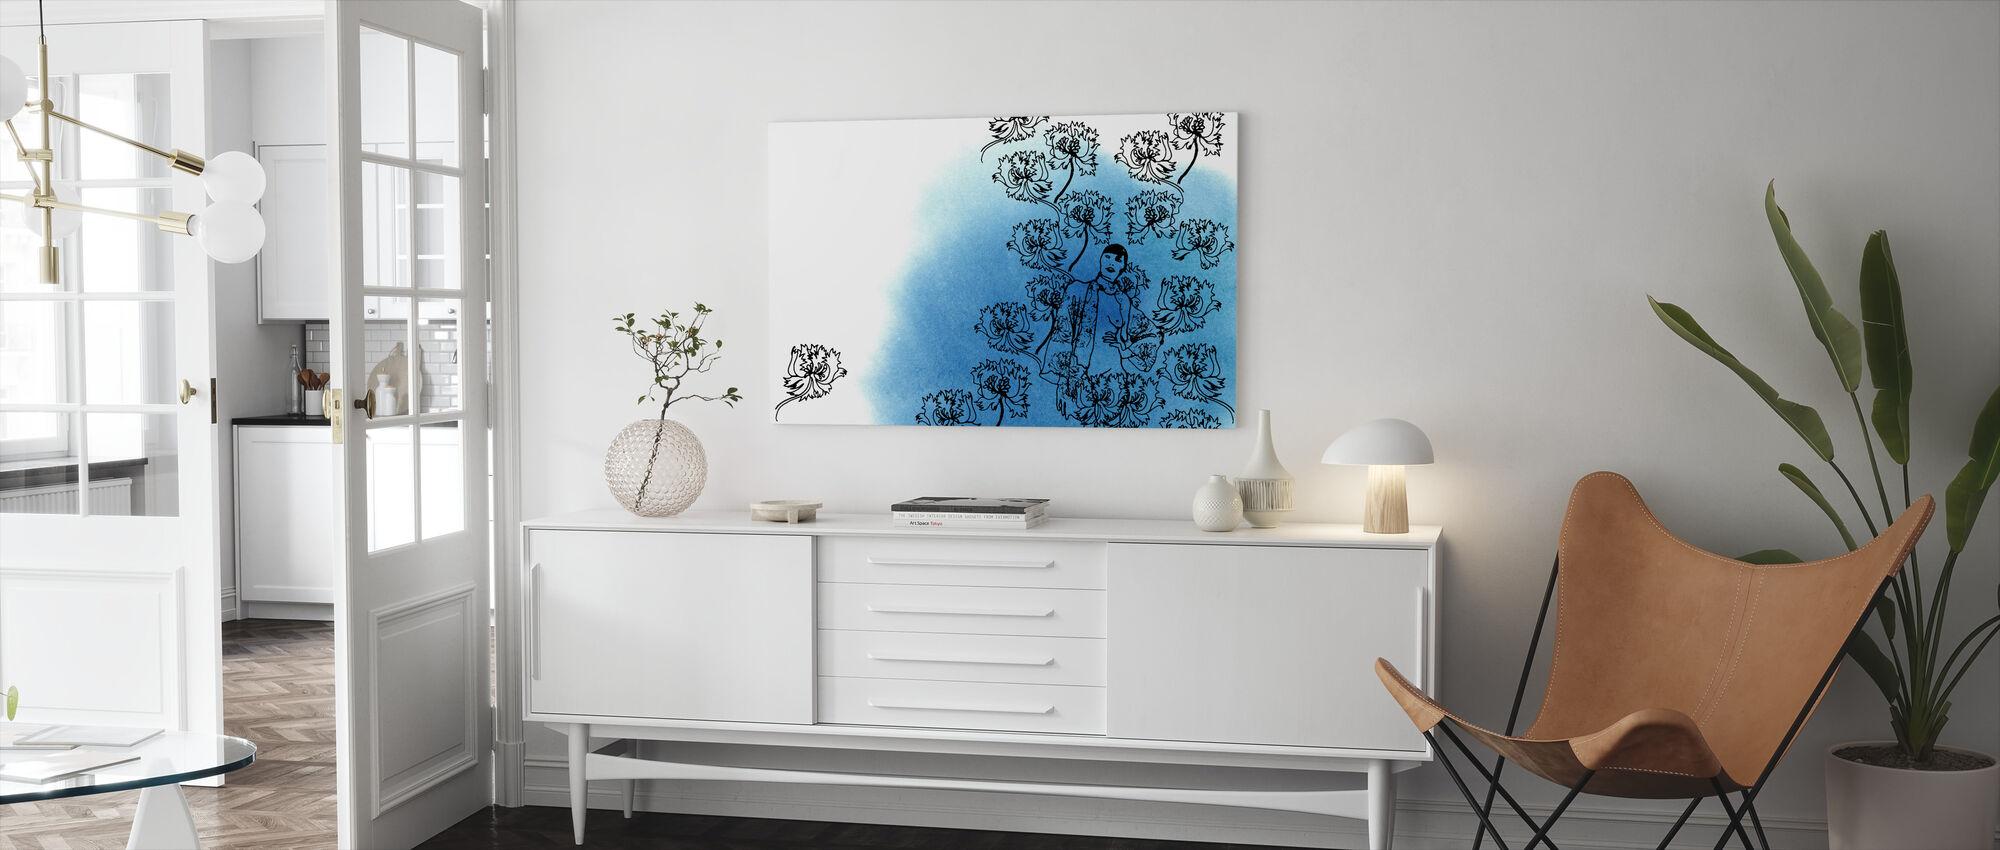 The Roaring Twenties - Canvas print - Living Room